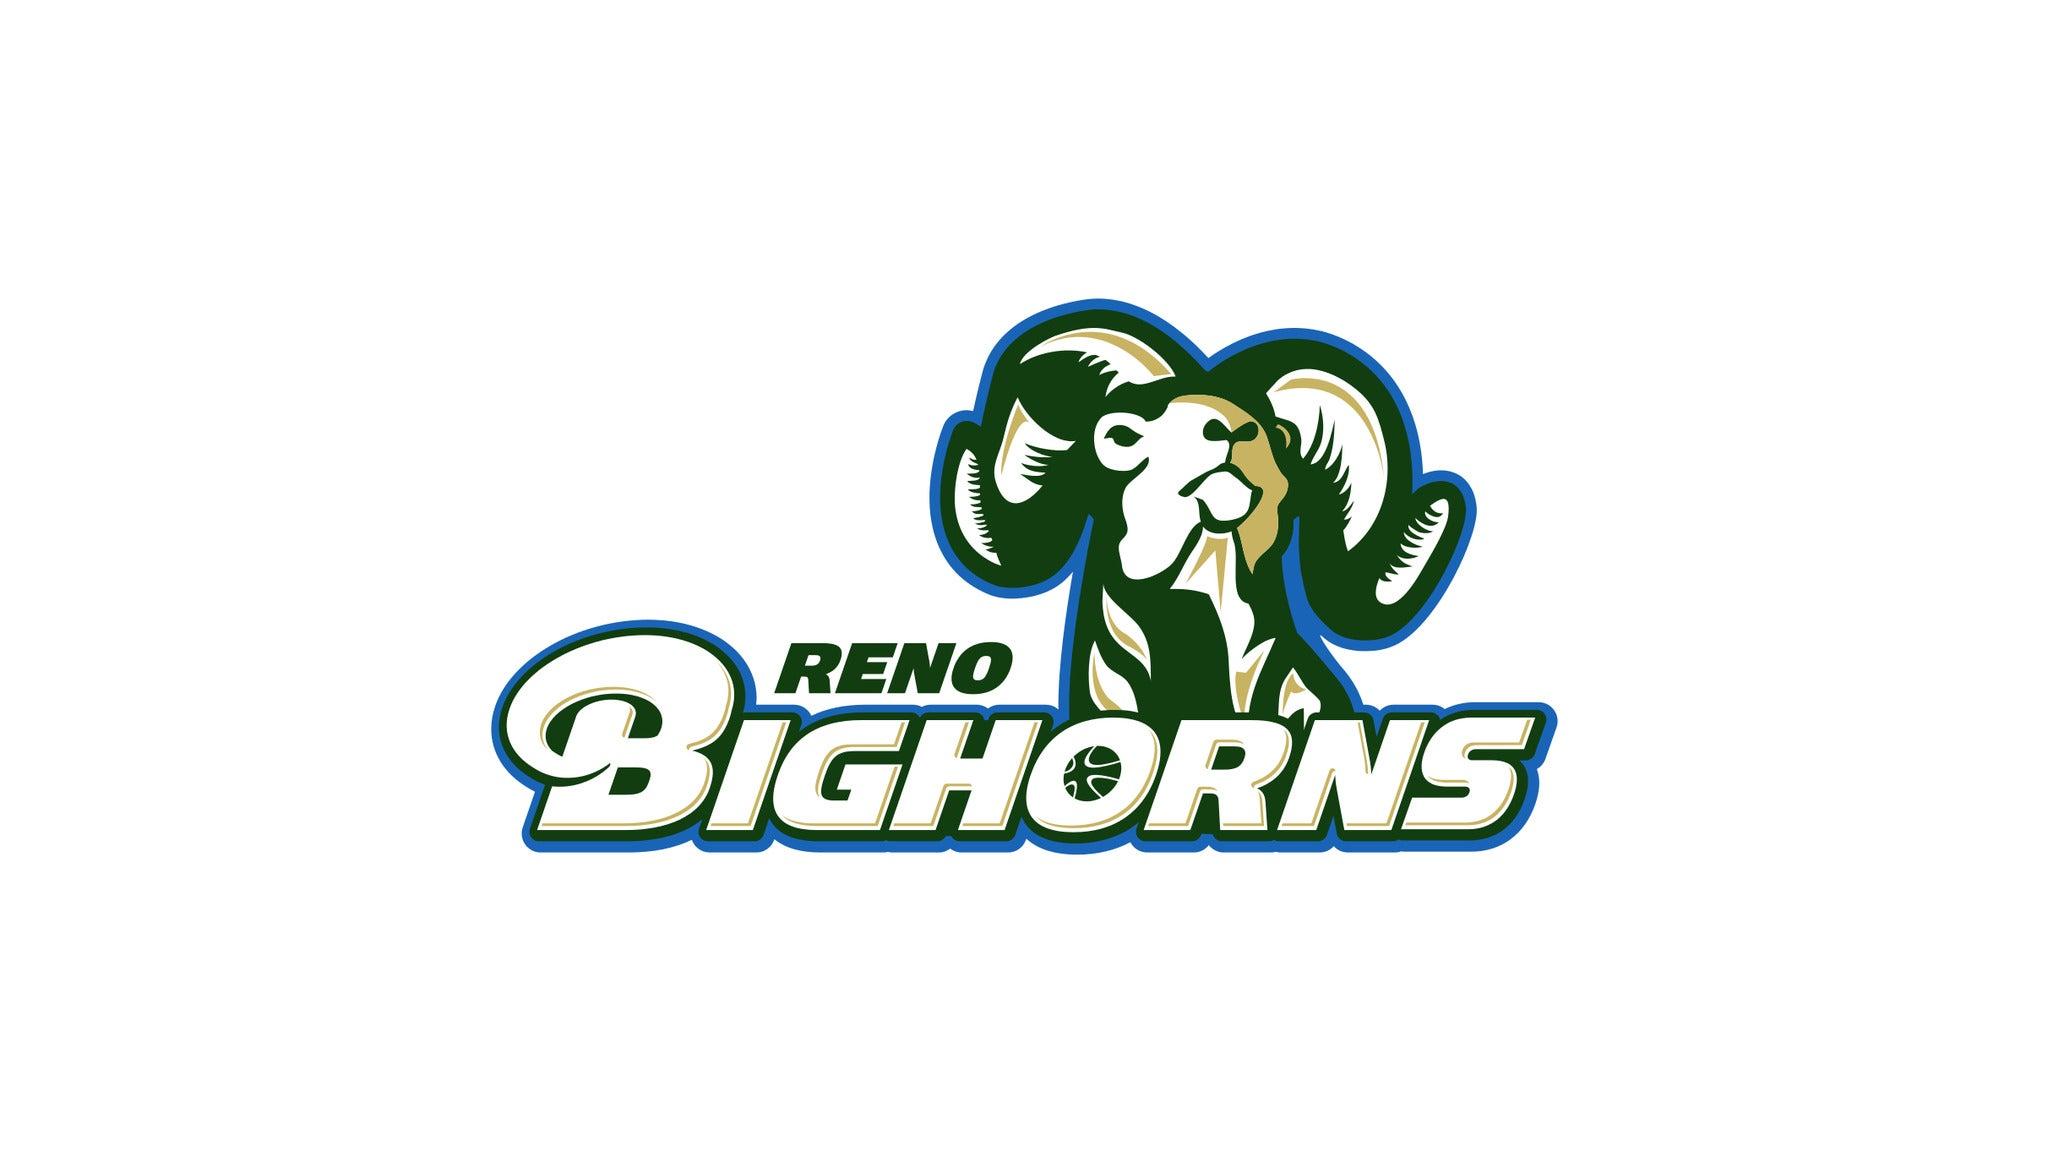 Reno Bighorns vs. Santa Cruz Warriors at Golden 1 Center